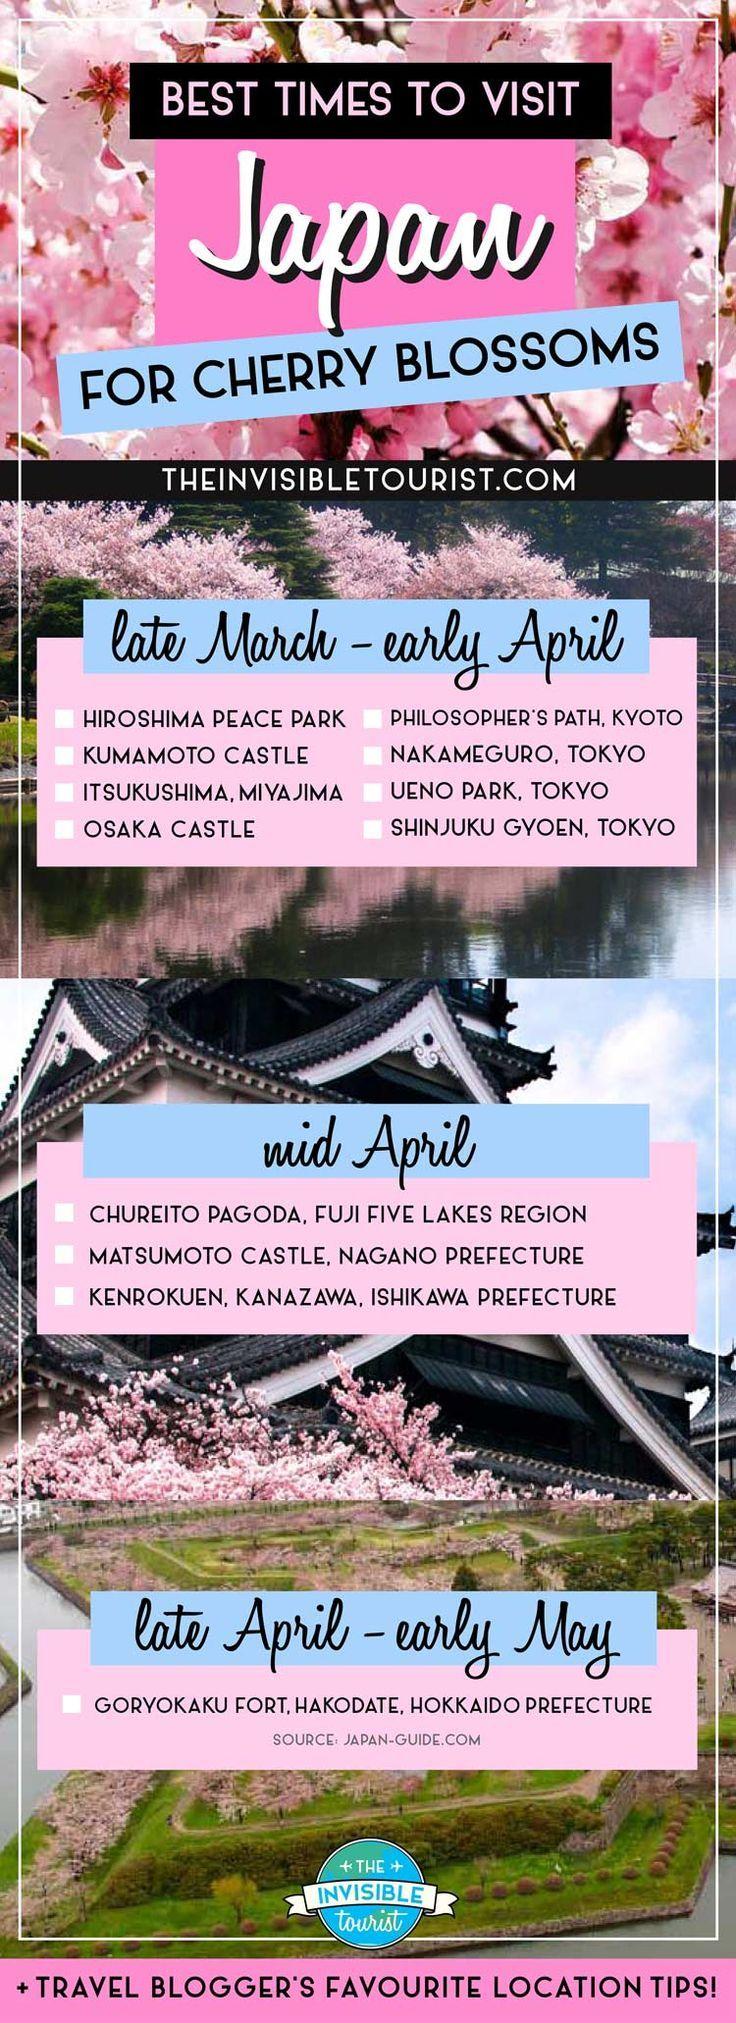 The Best Time To Visit Japan For Cherry Blossoms Revealed Japan Travel Destinations Visit Japan Japan Travel Tips